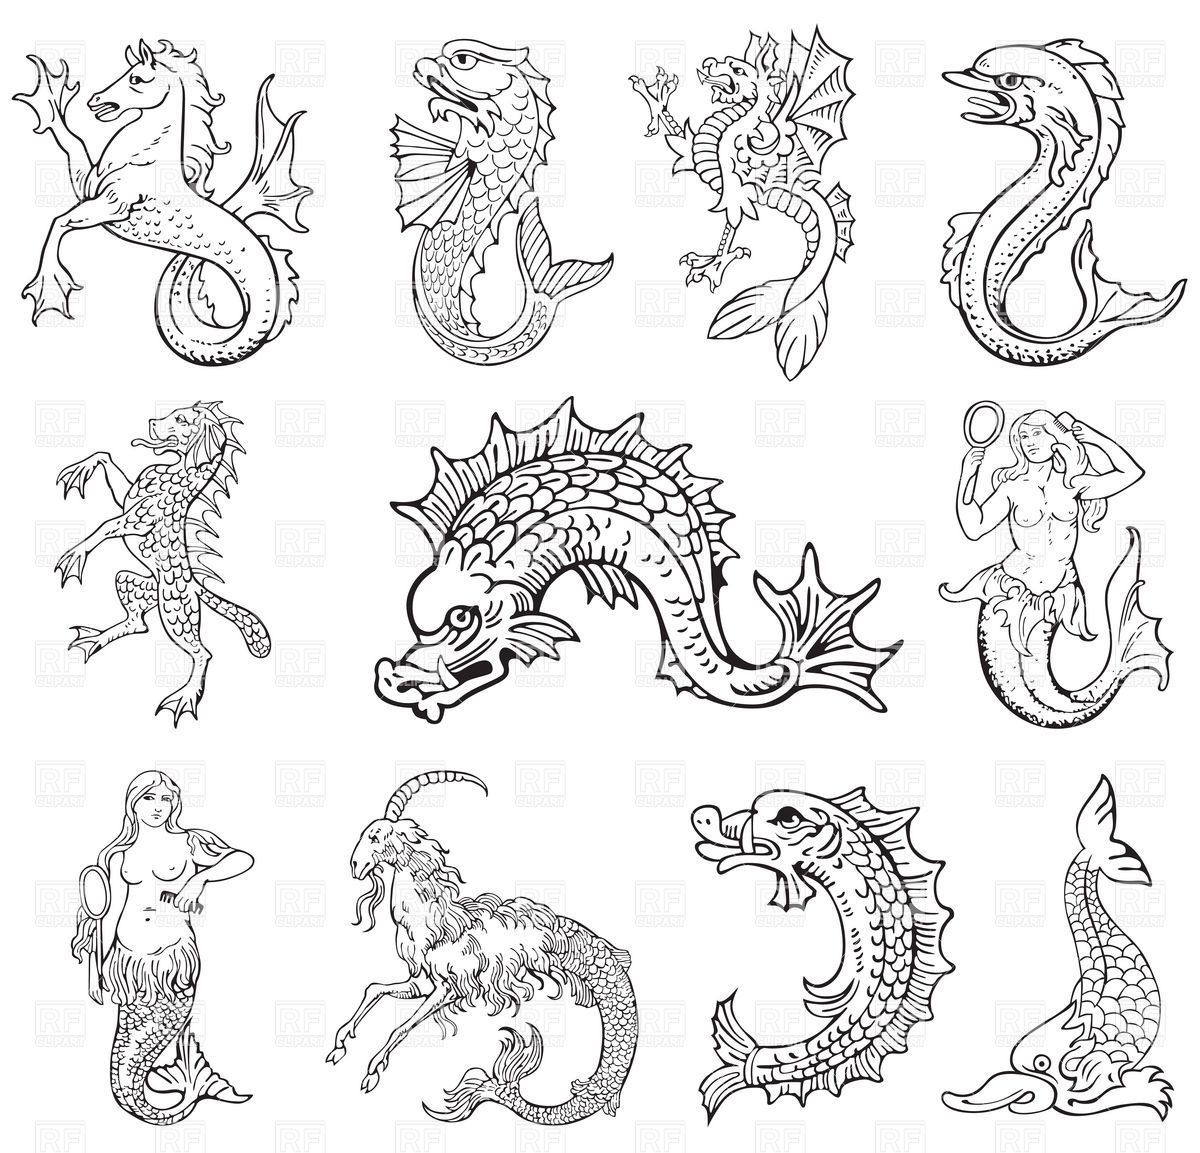 Antique Sea Monsters